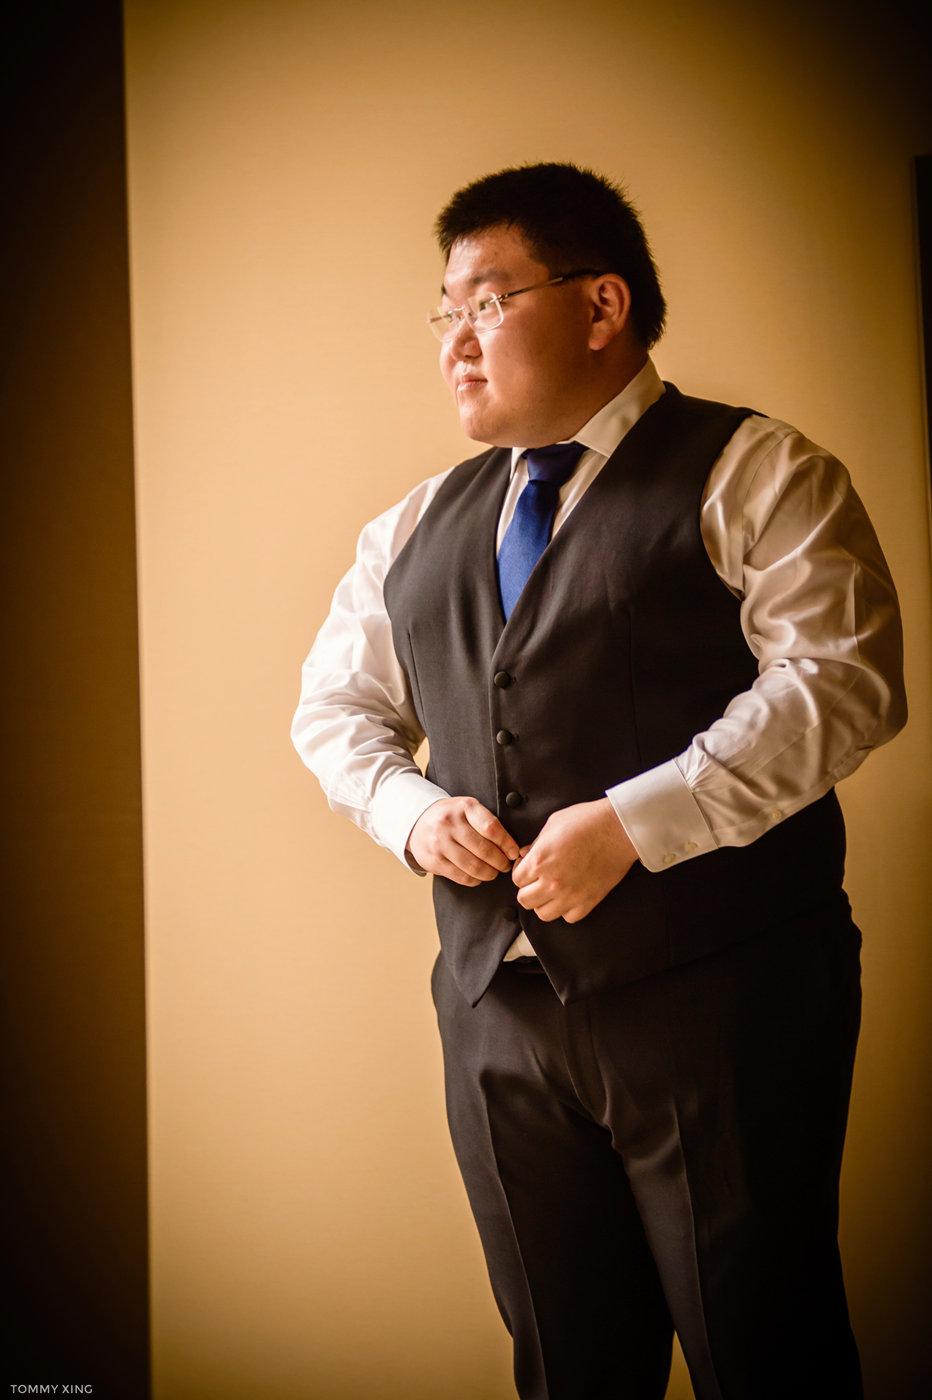 STANFORD MEMORIAL CHURCH WEDDING - Wenjie & Chengcheng - SAN FRANCISCO BAY AREA 斯坦福教堂婚礼跟拍 - 洛杉矶婚礼婚纱照摄影师 Tommy Xing Photography032.jpg